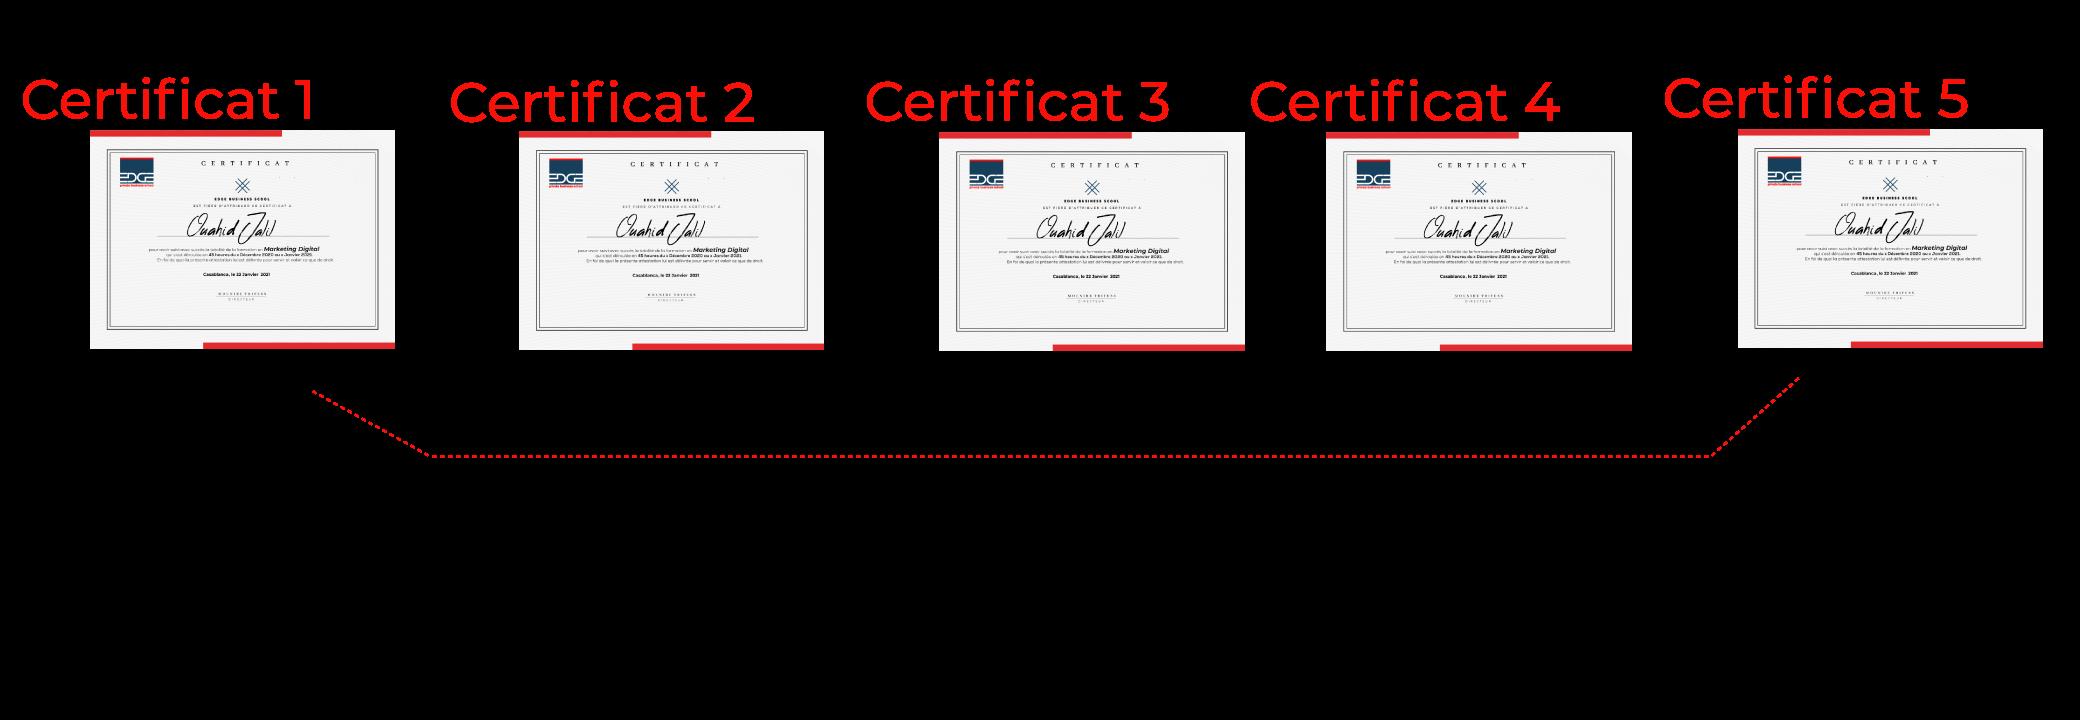 certificats professionnels